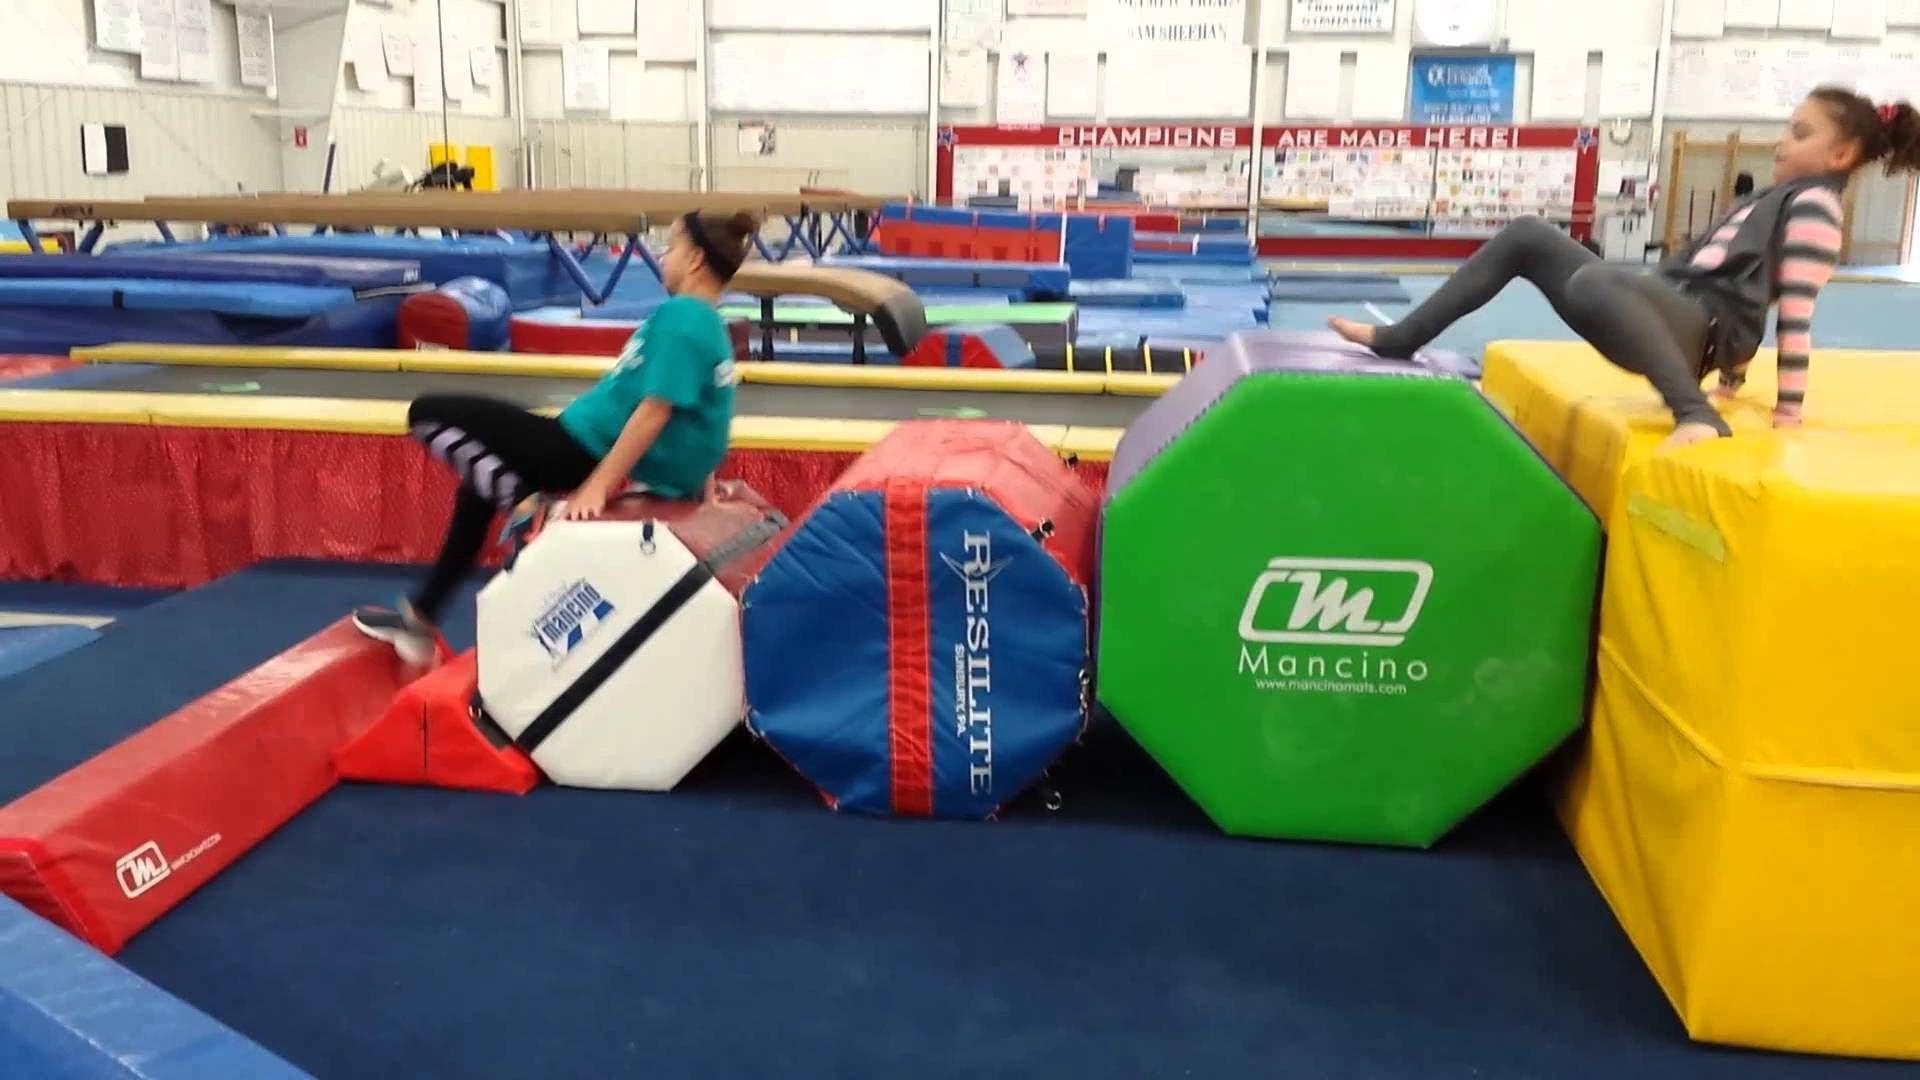 Pin By Mancino On Mancino Custom Gyms Gymnastics Equipment Amazing Gymnastics Gymnastics Mats